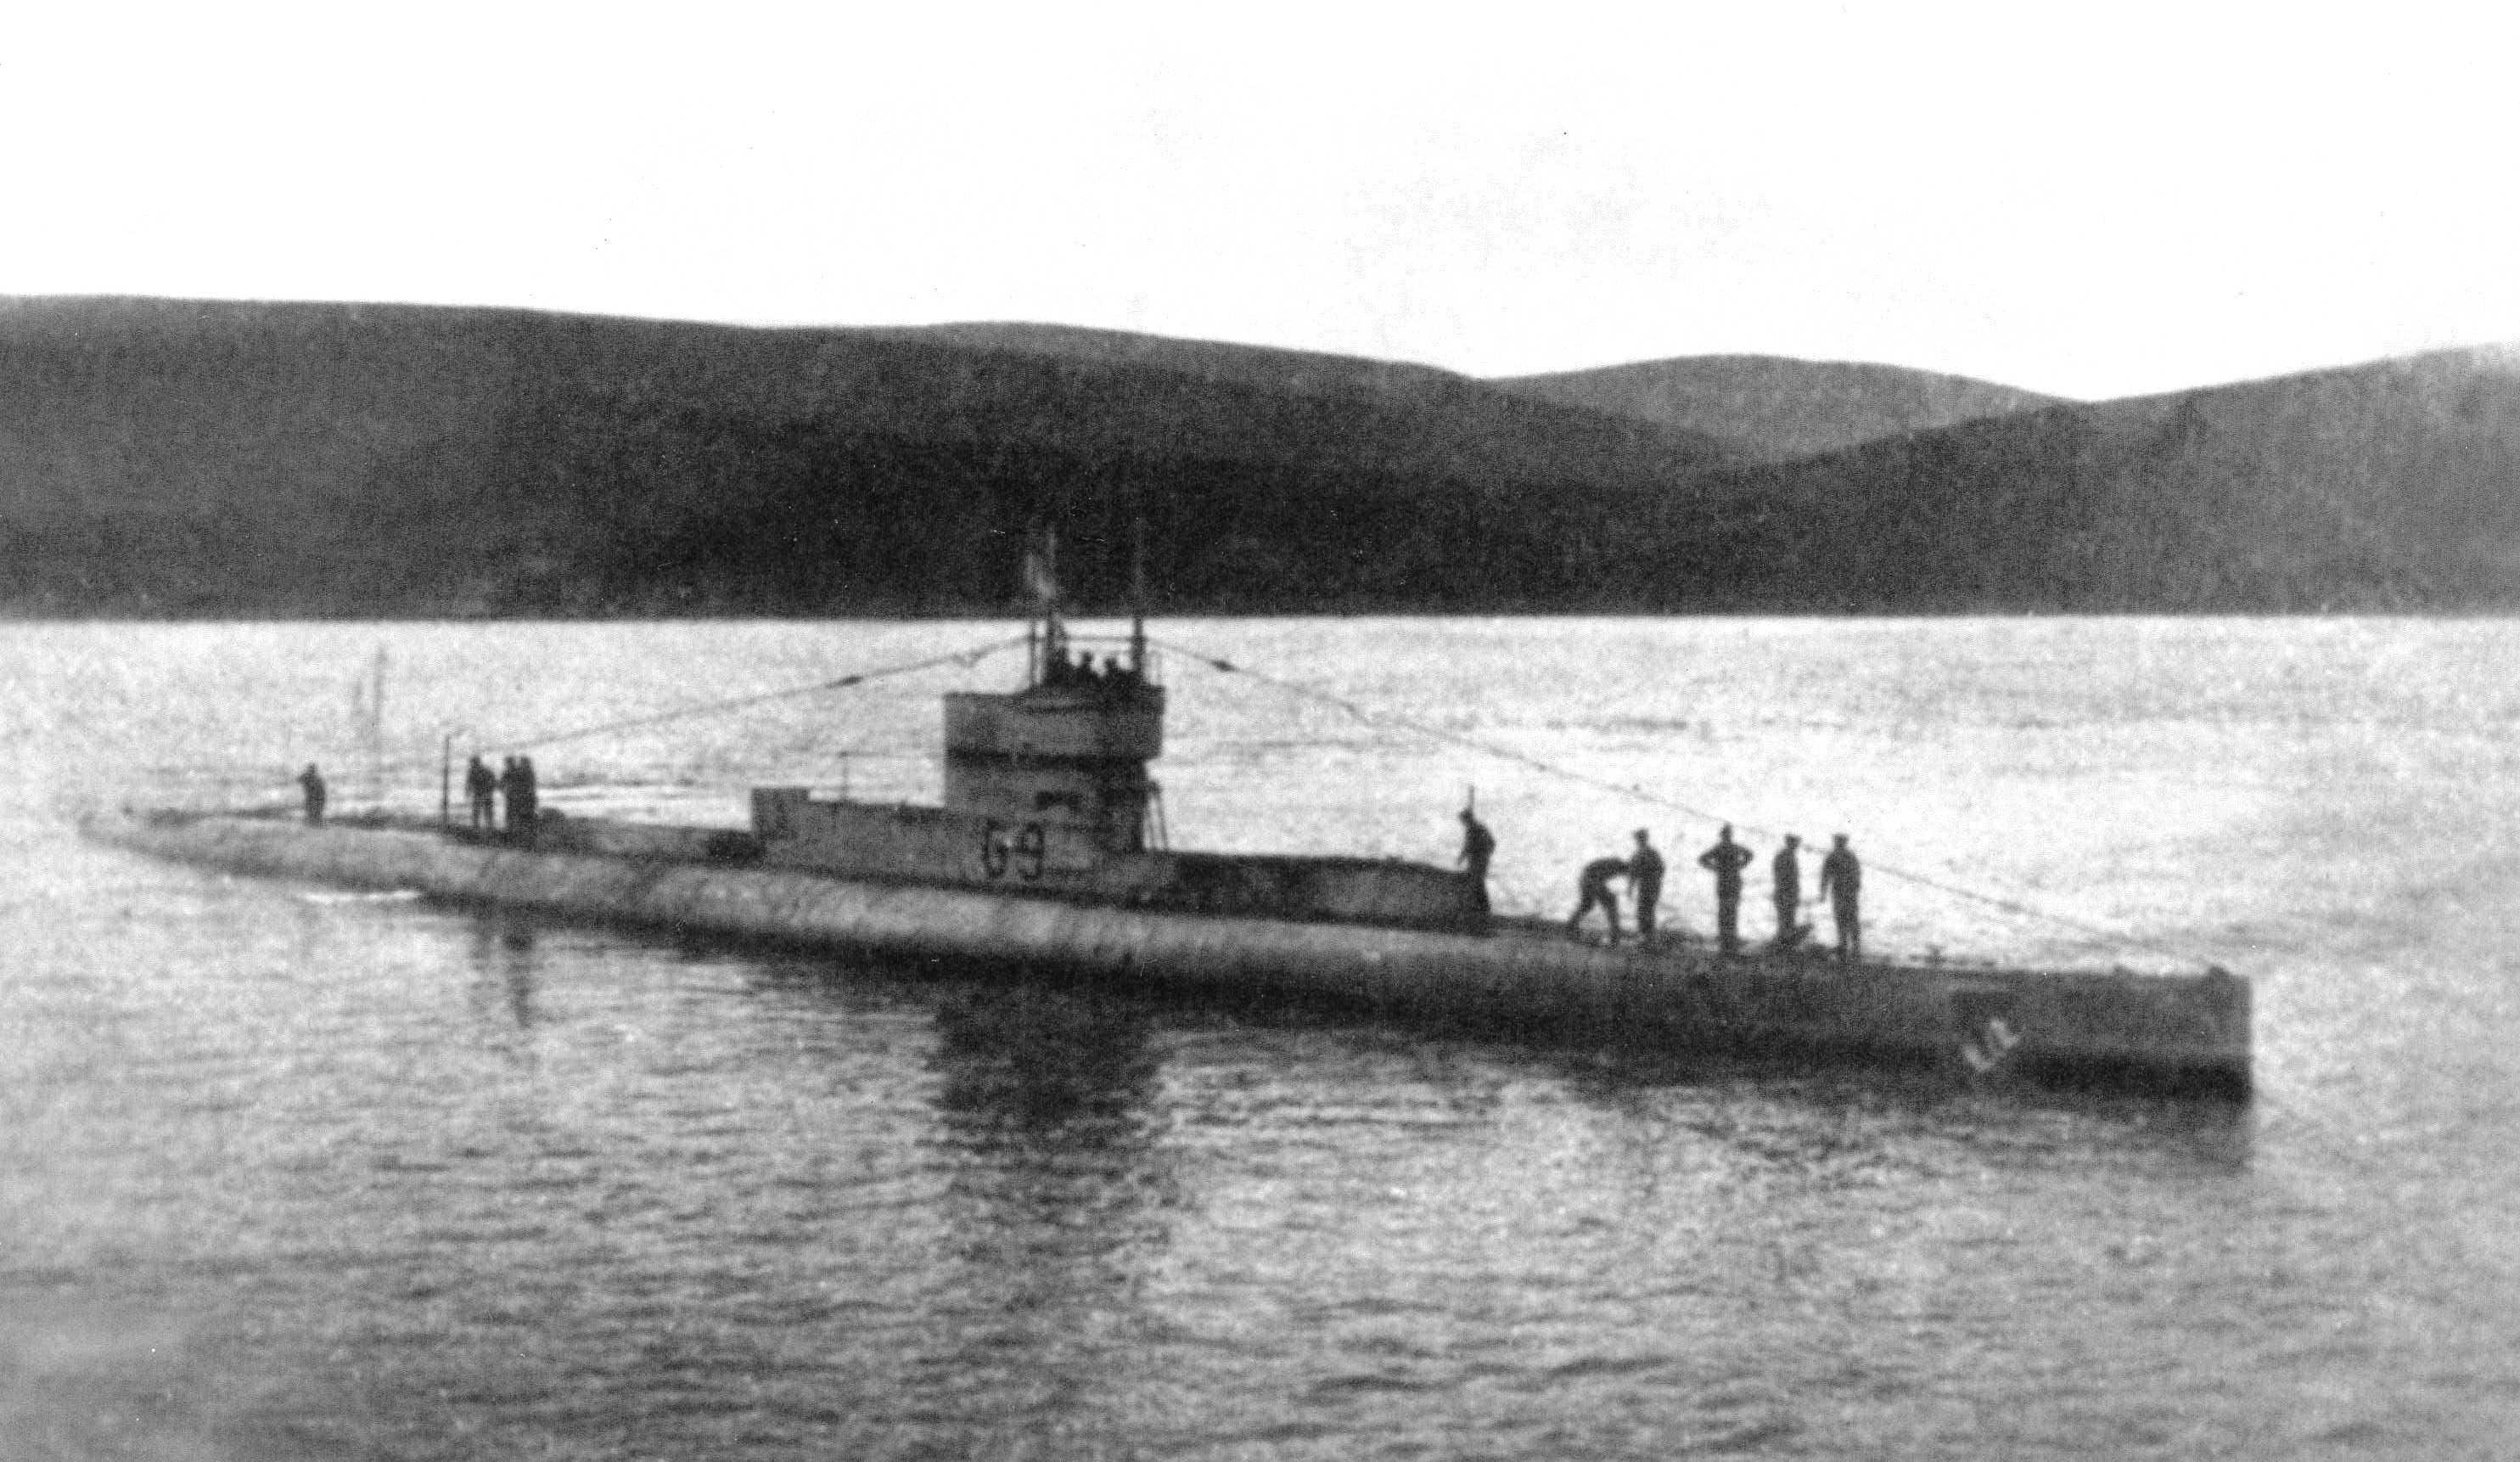 HMS G9 - Wikipedia